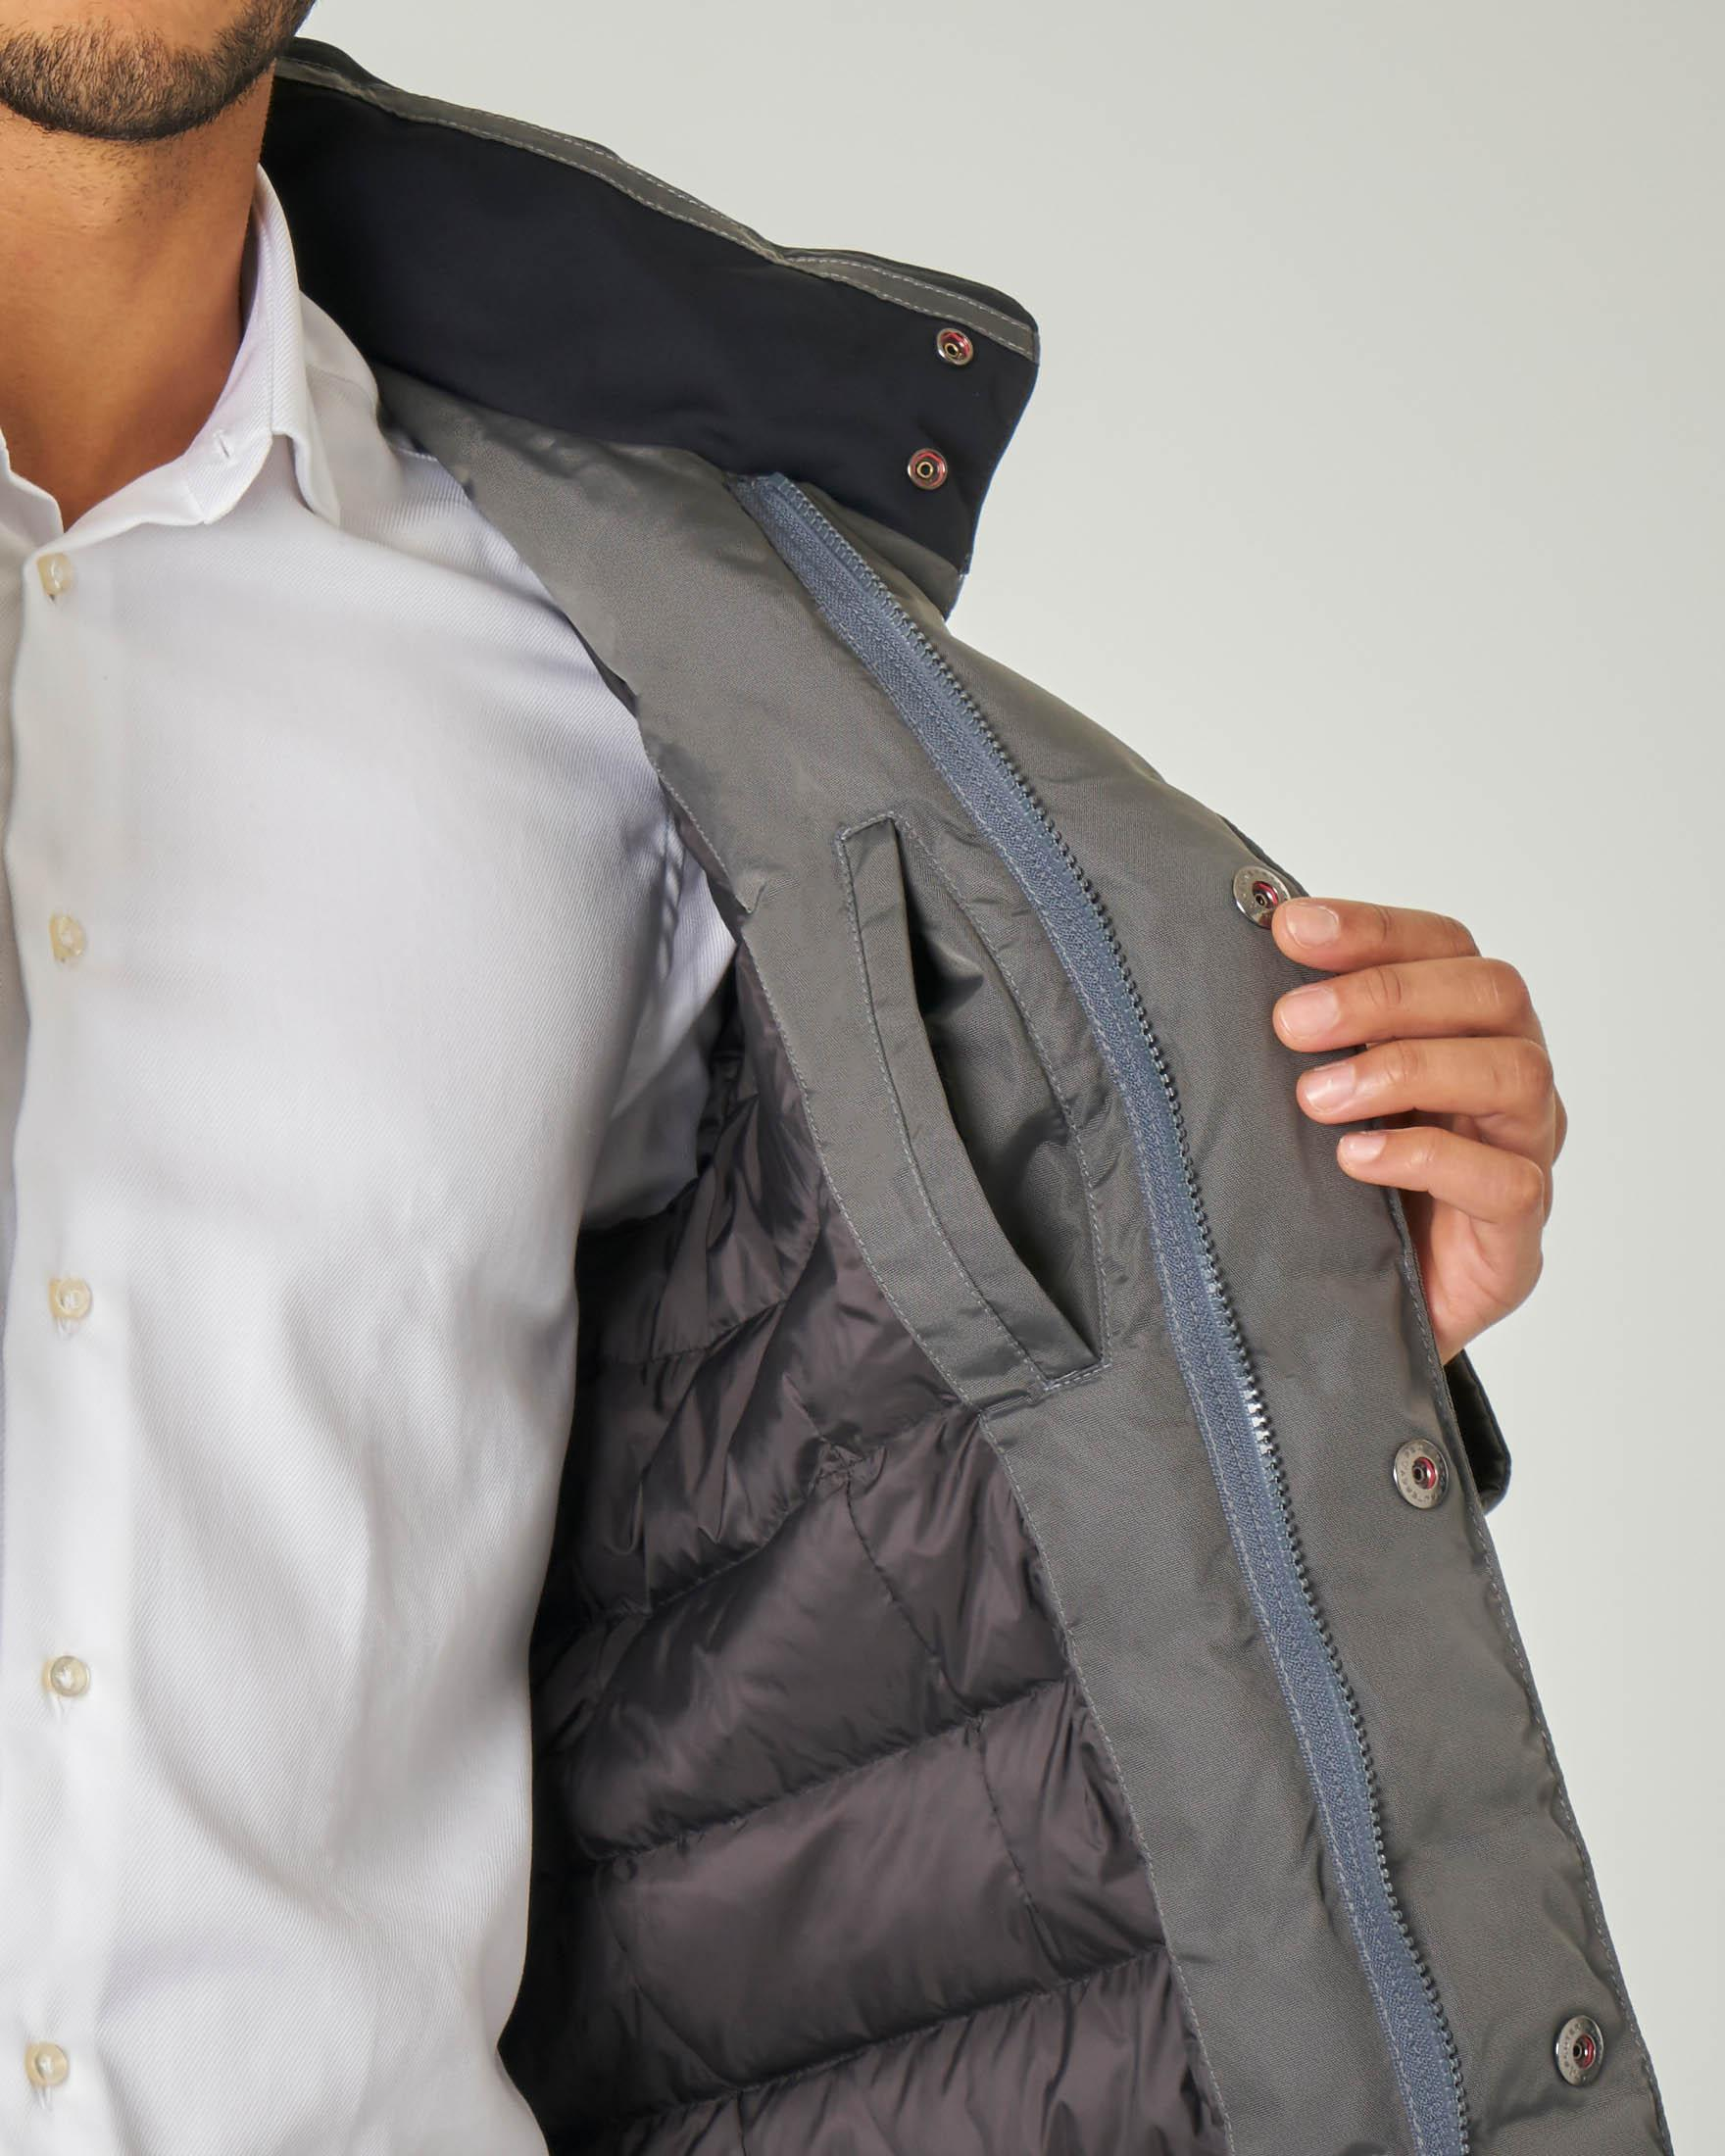 Field Jacket Stripes grigia in tessuto oxford tecnico